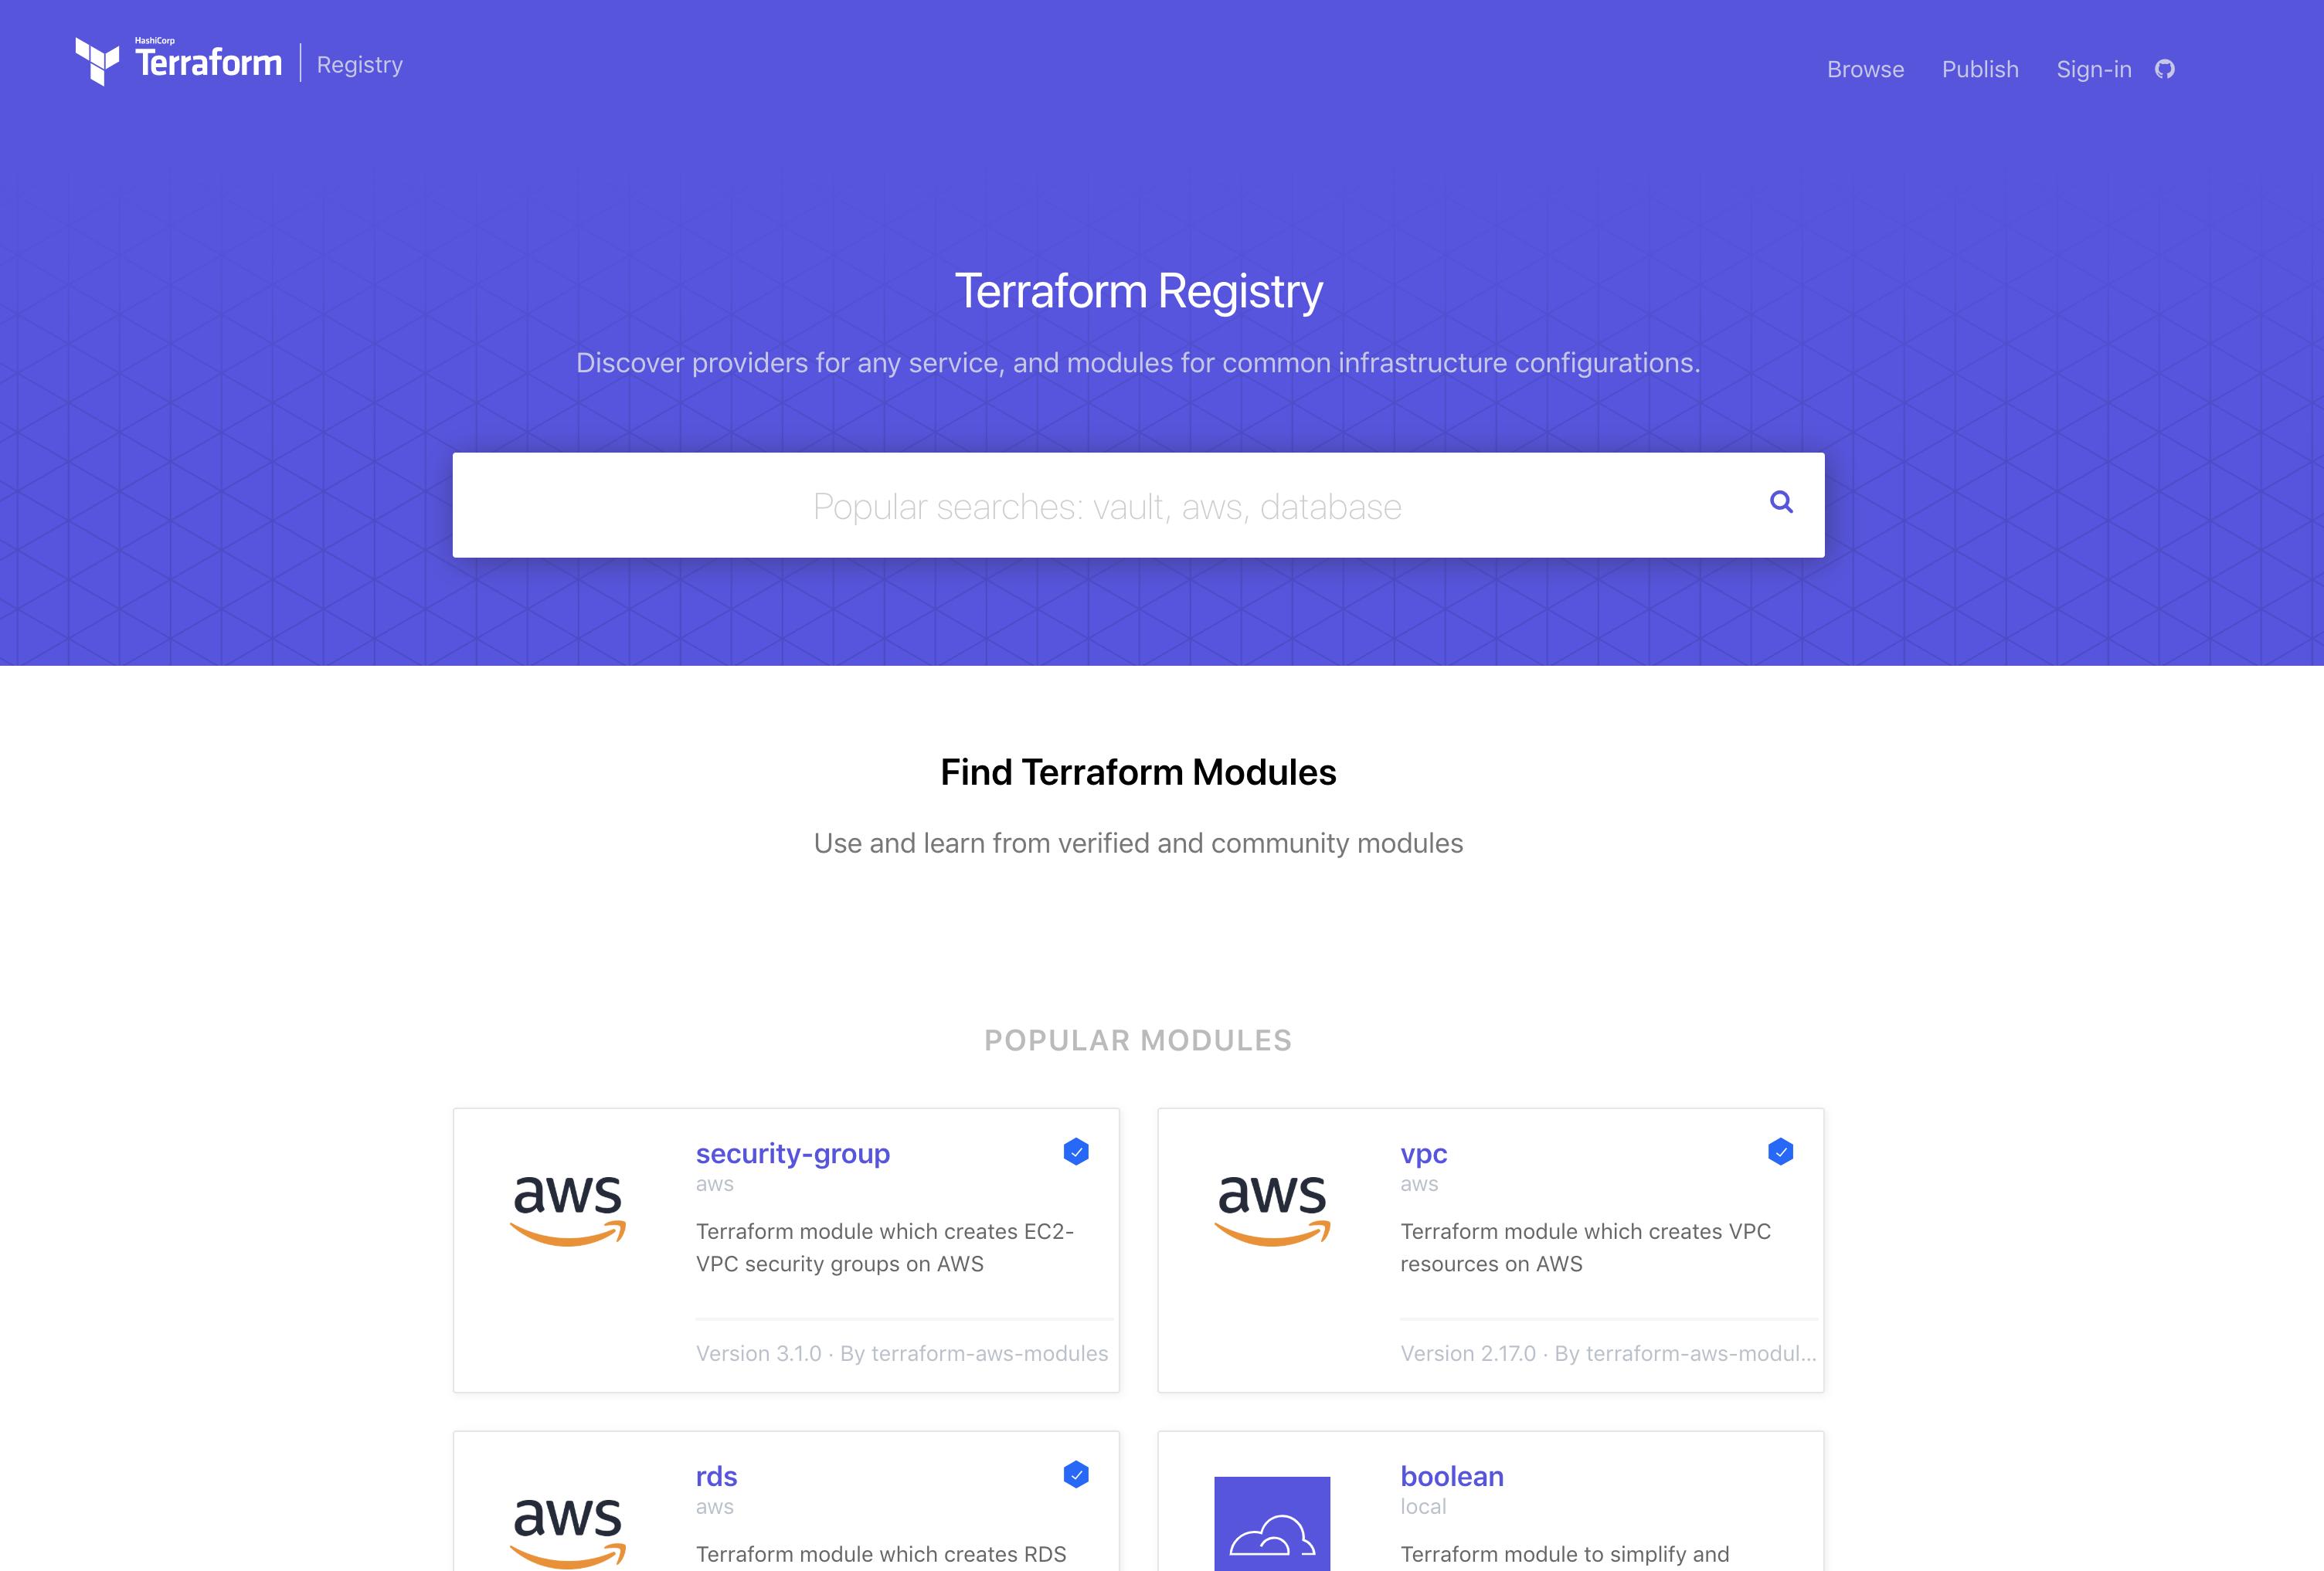 The Terraform Registry